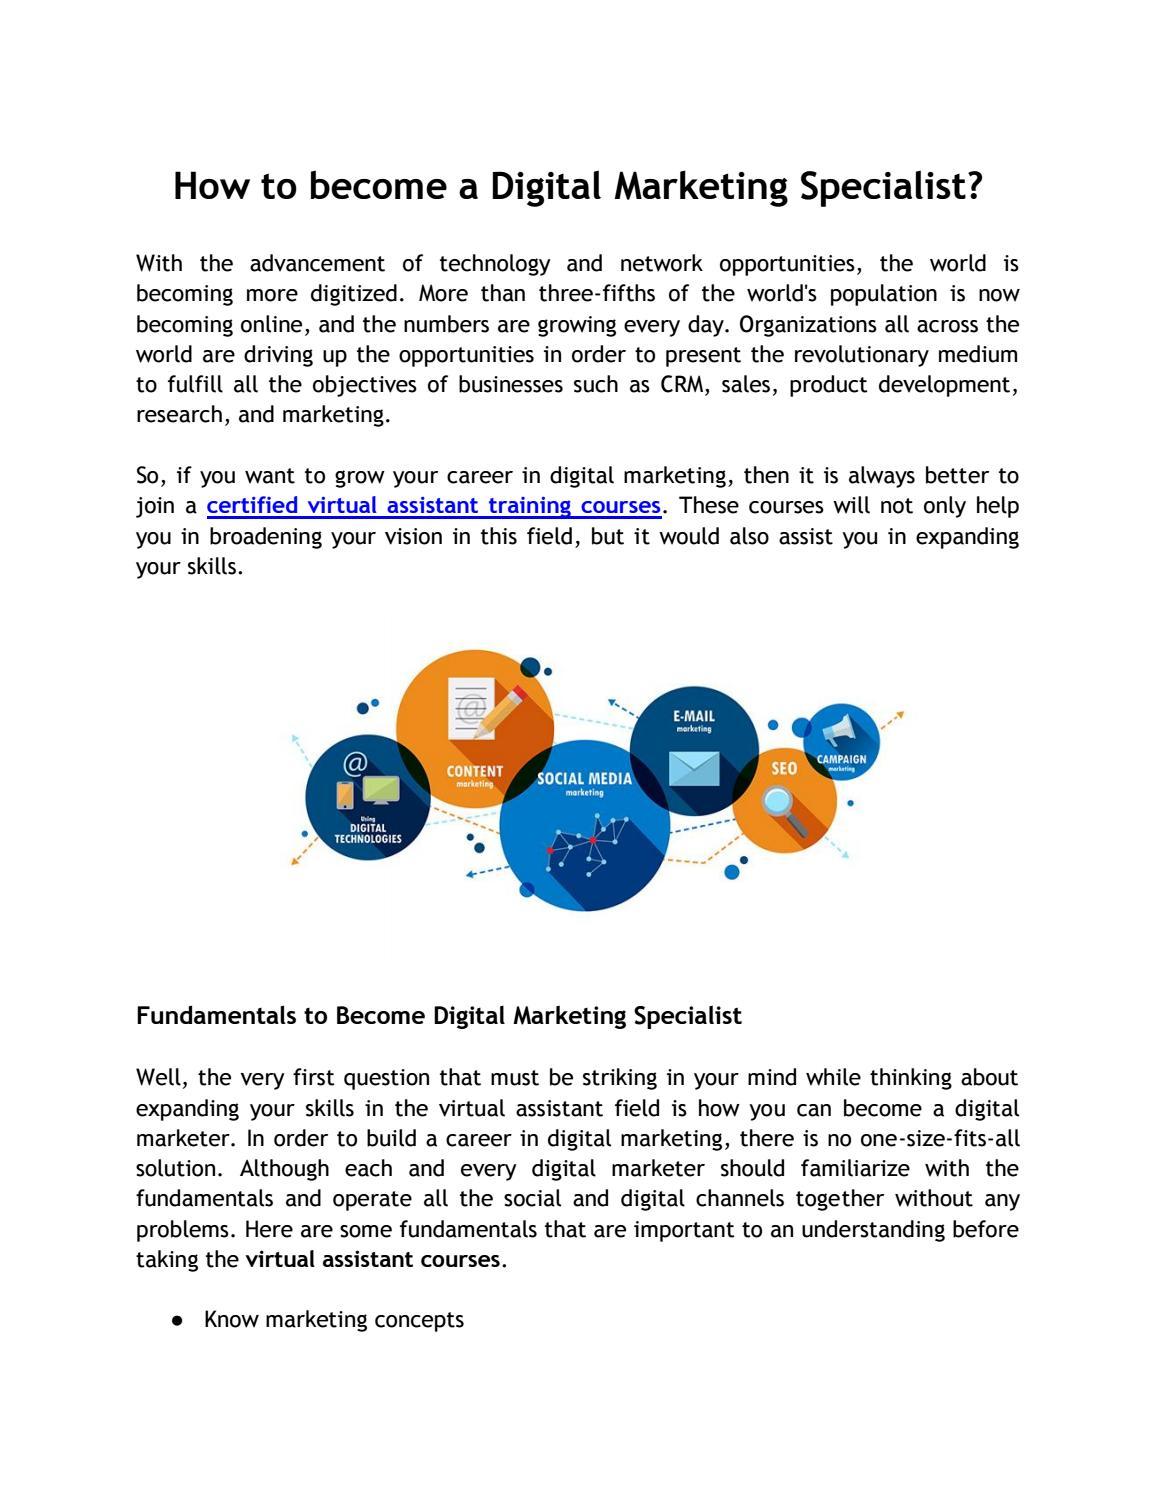 How To Become A Digital Marketing Specialist By Virtualgurusa Cademy Issuu